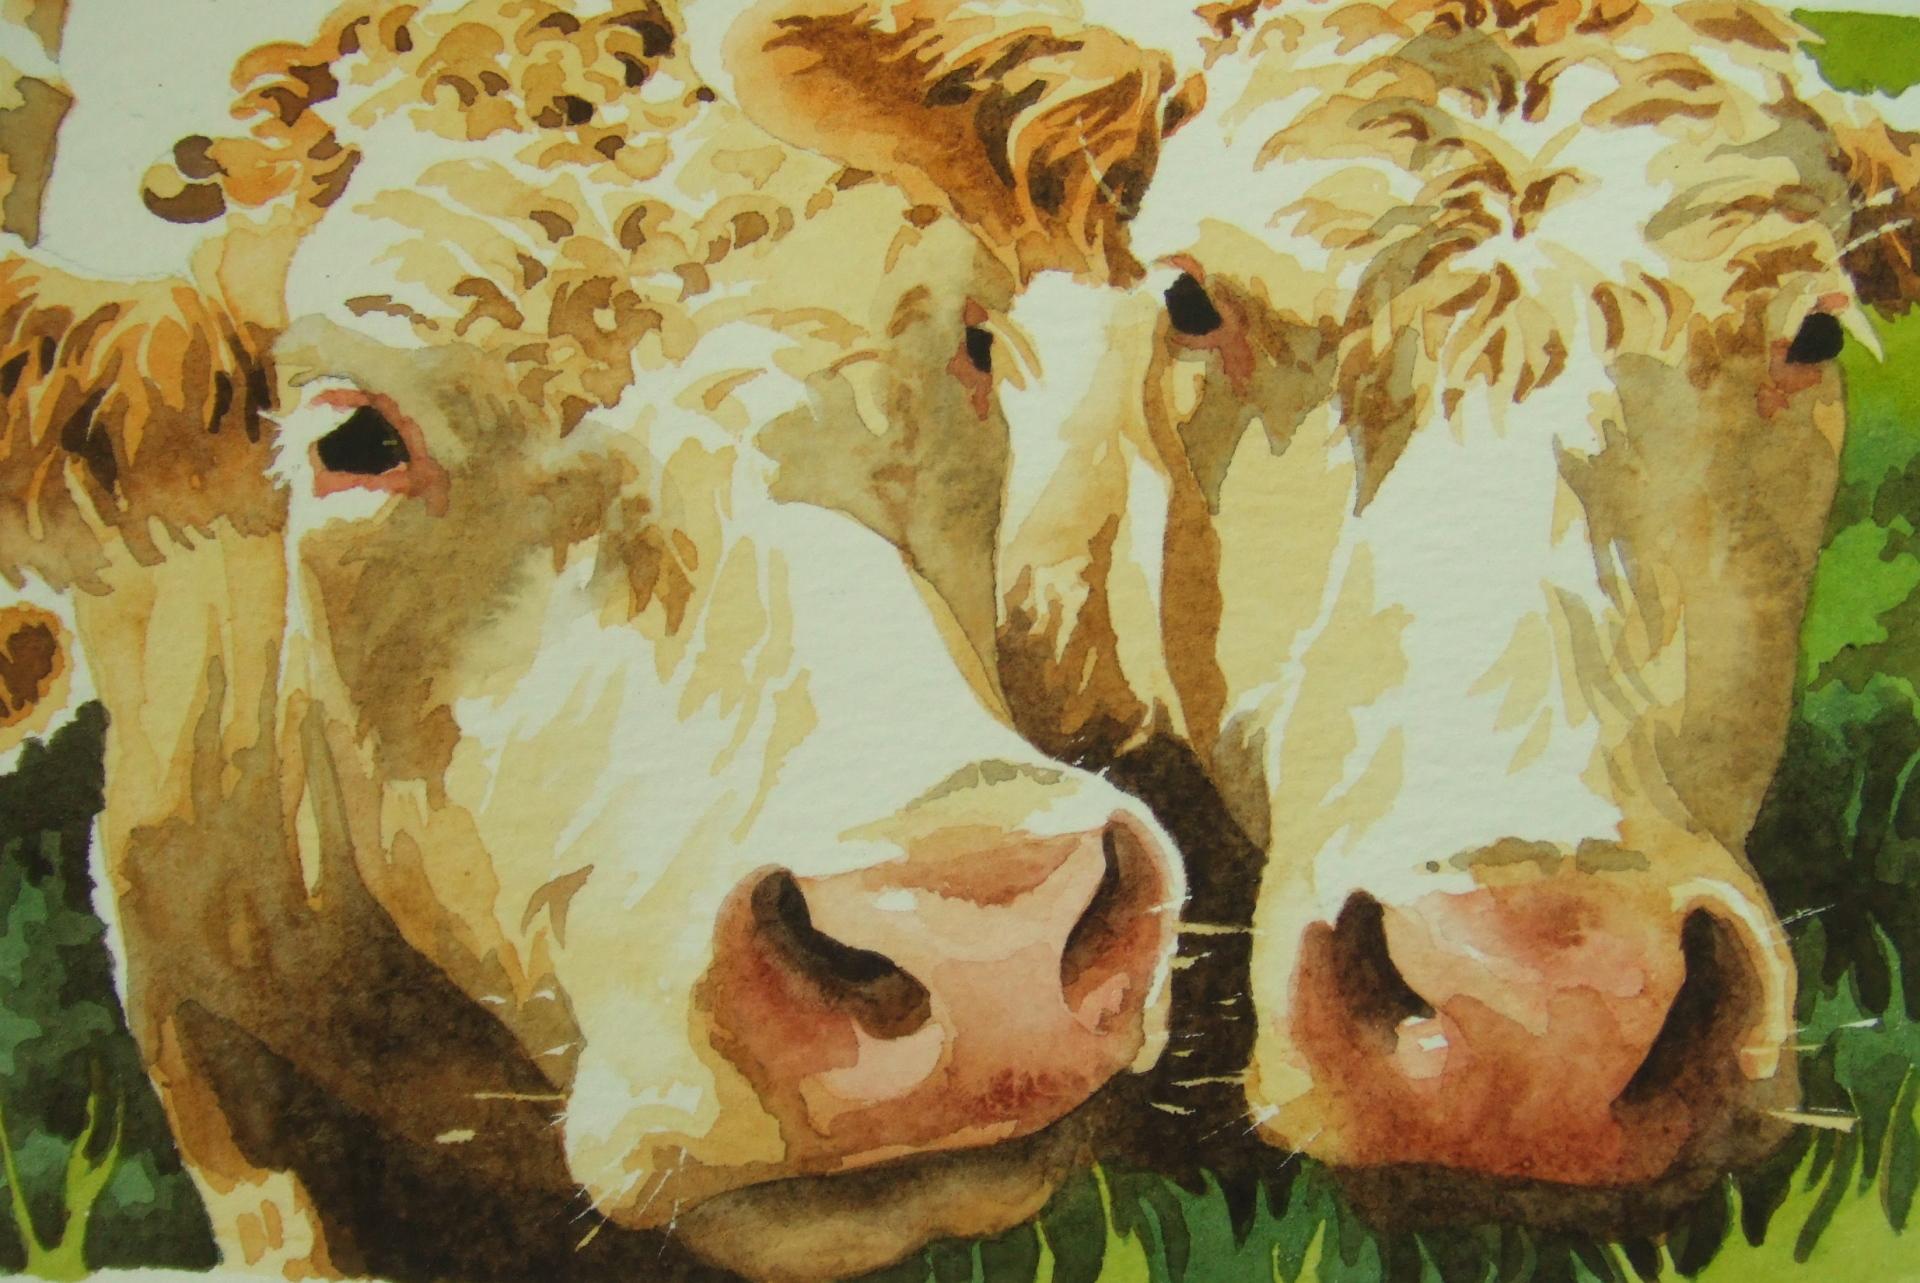 Two cream cows